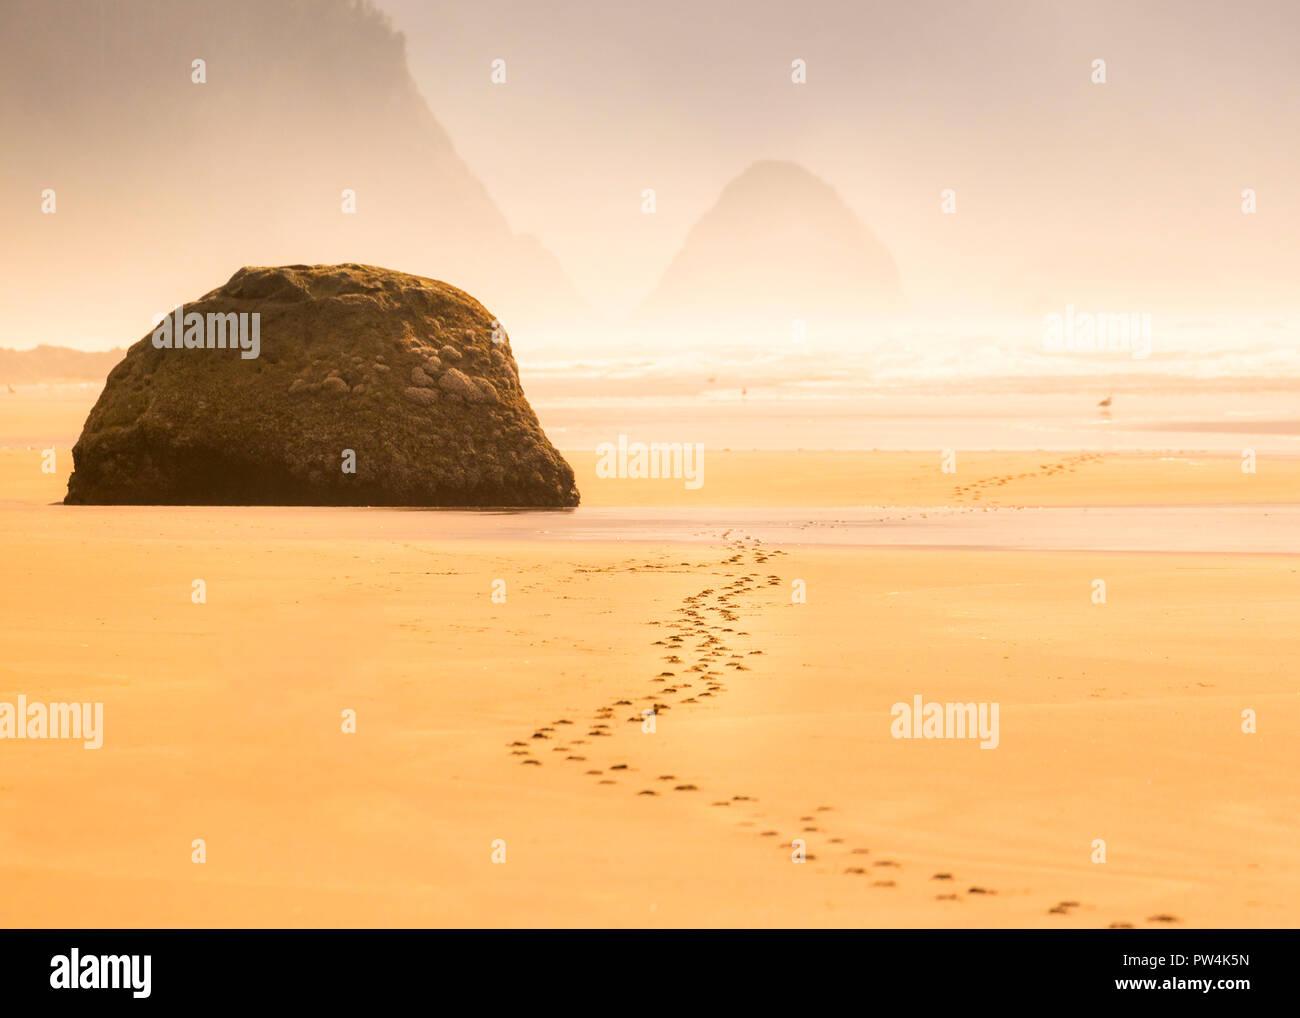 Footprints in the sand near Hug Point on the Oregon coast, USA. - Stock Image